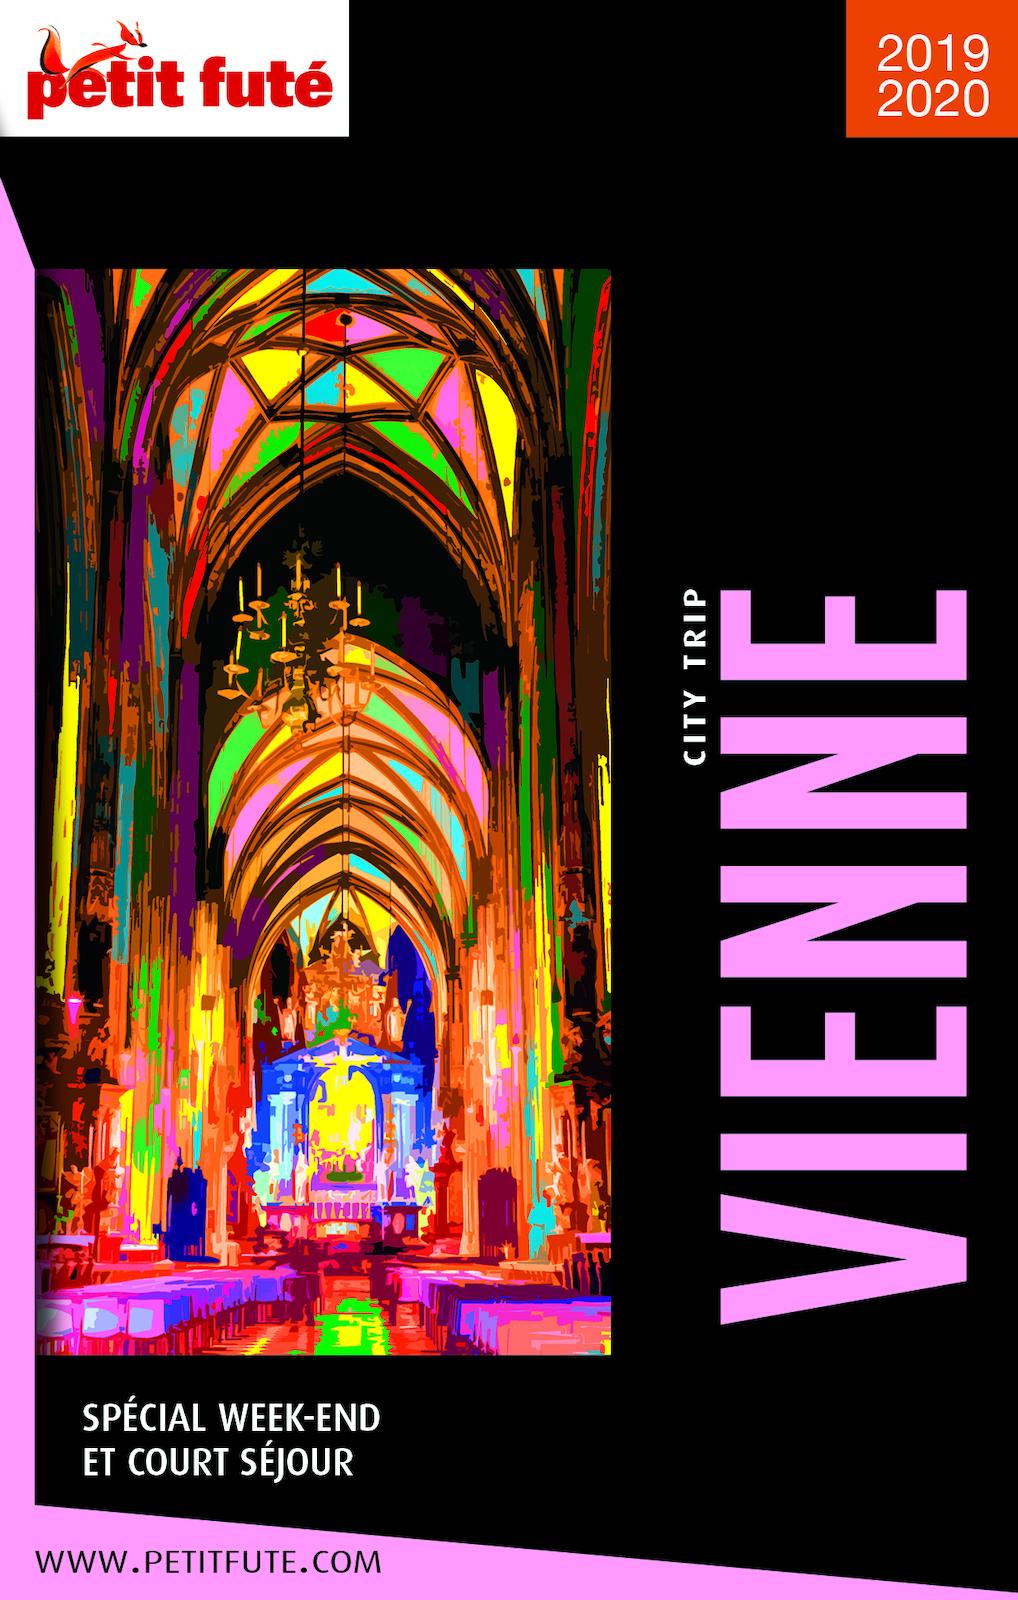 VIENNE CITY TRIP 2019/2020 City trip Petit Fut?